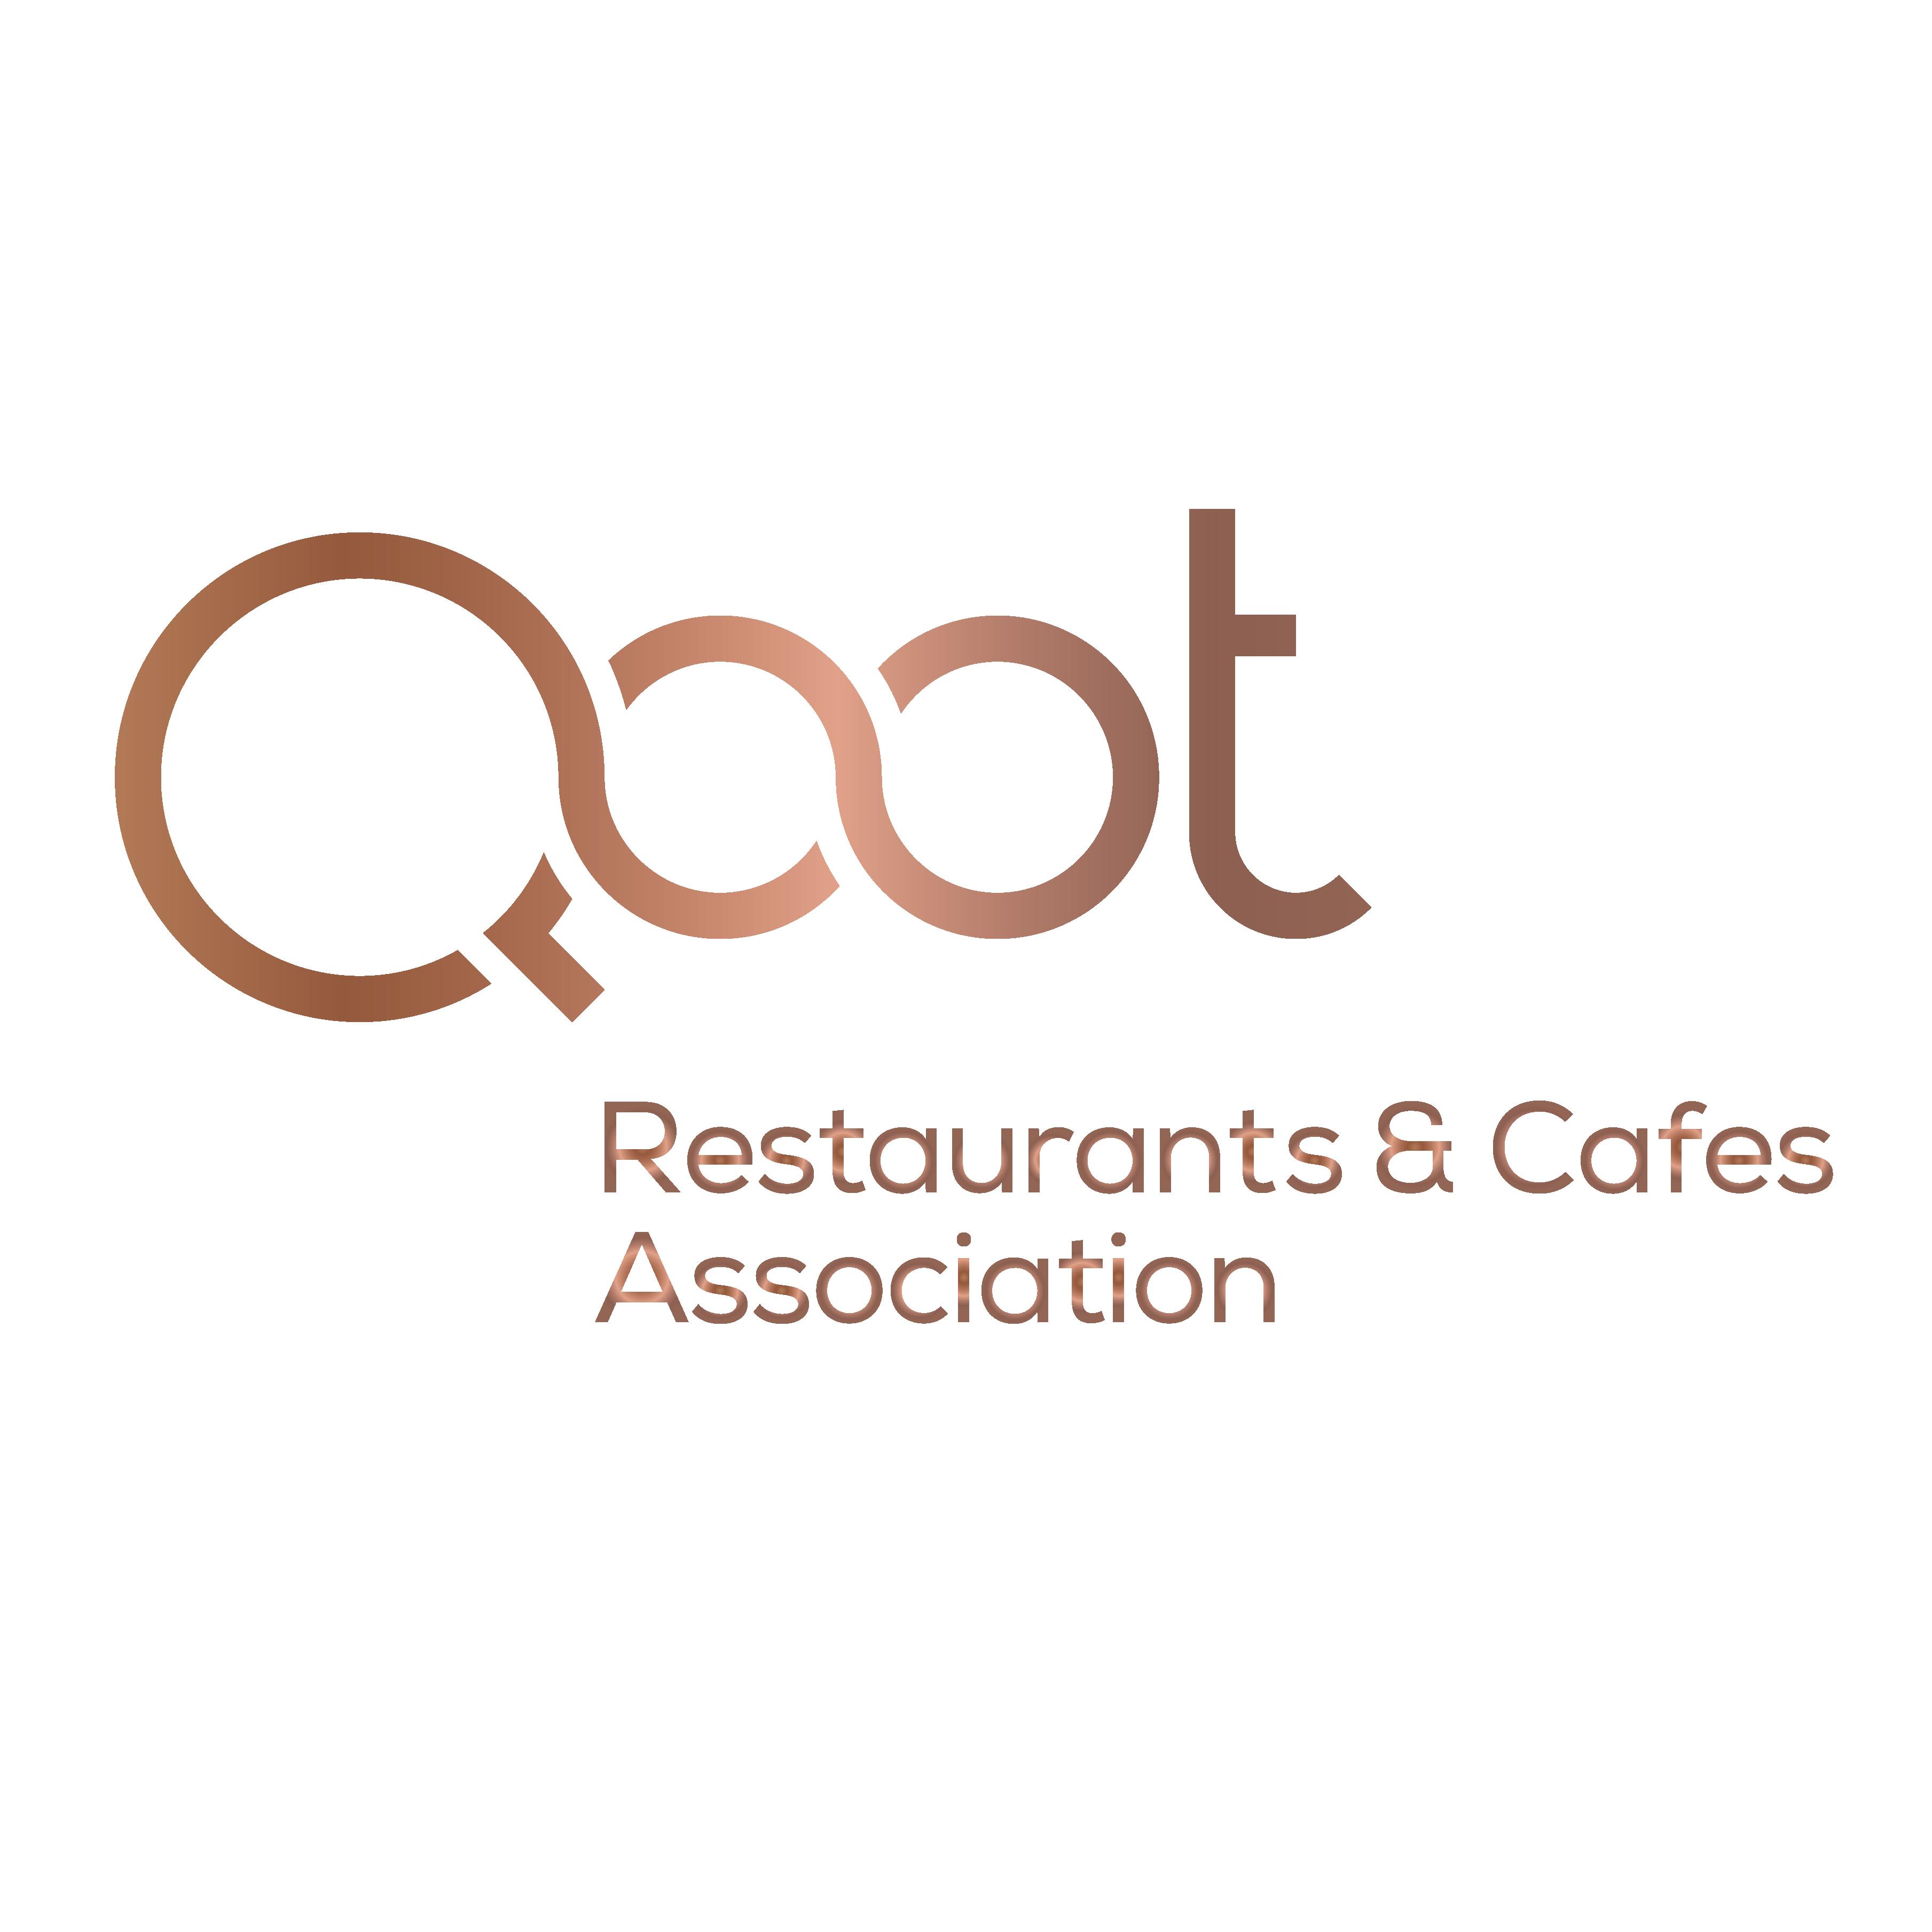 Qoot_Brandmark Variations Logo-07